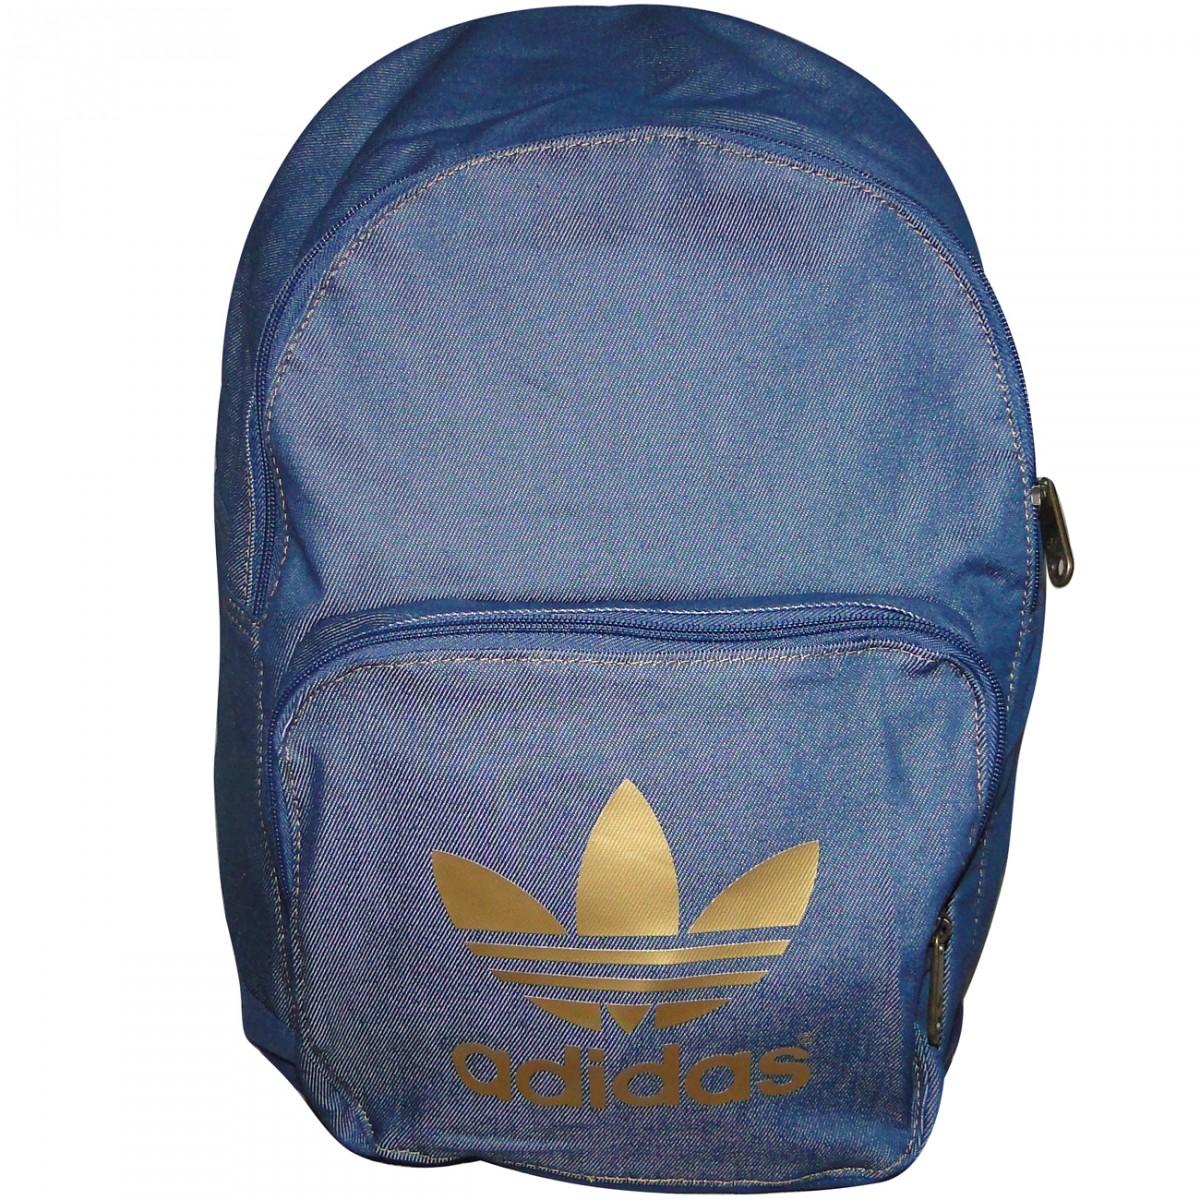 360d17cd6 Mochila Adidas BP Classic Jeans Z37779 - Jeans - Chuteira Nike ...